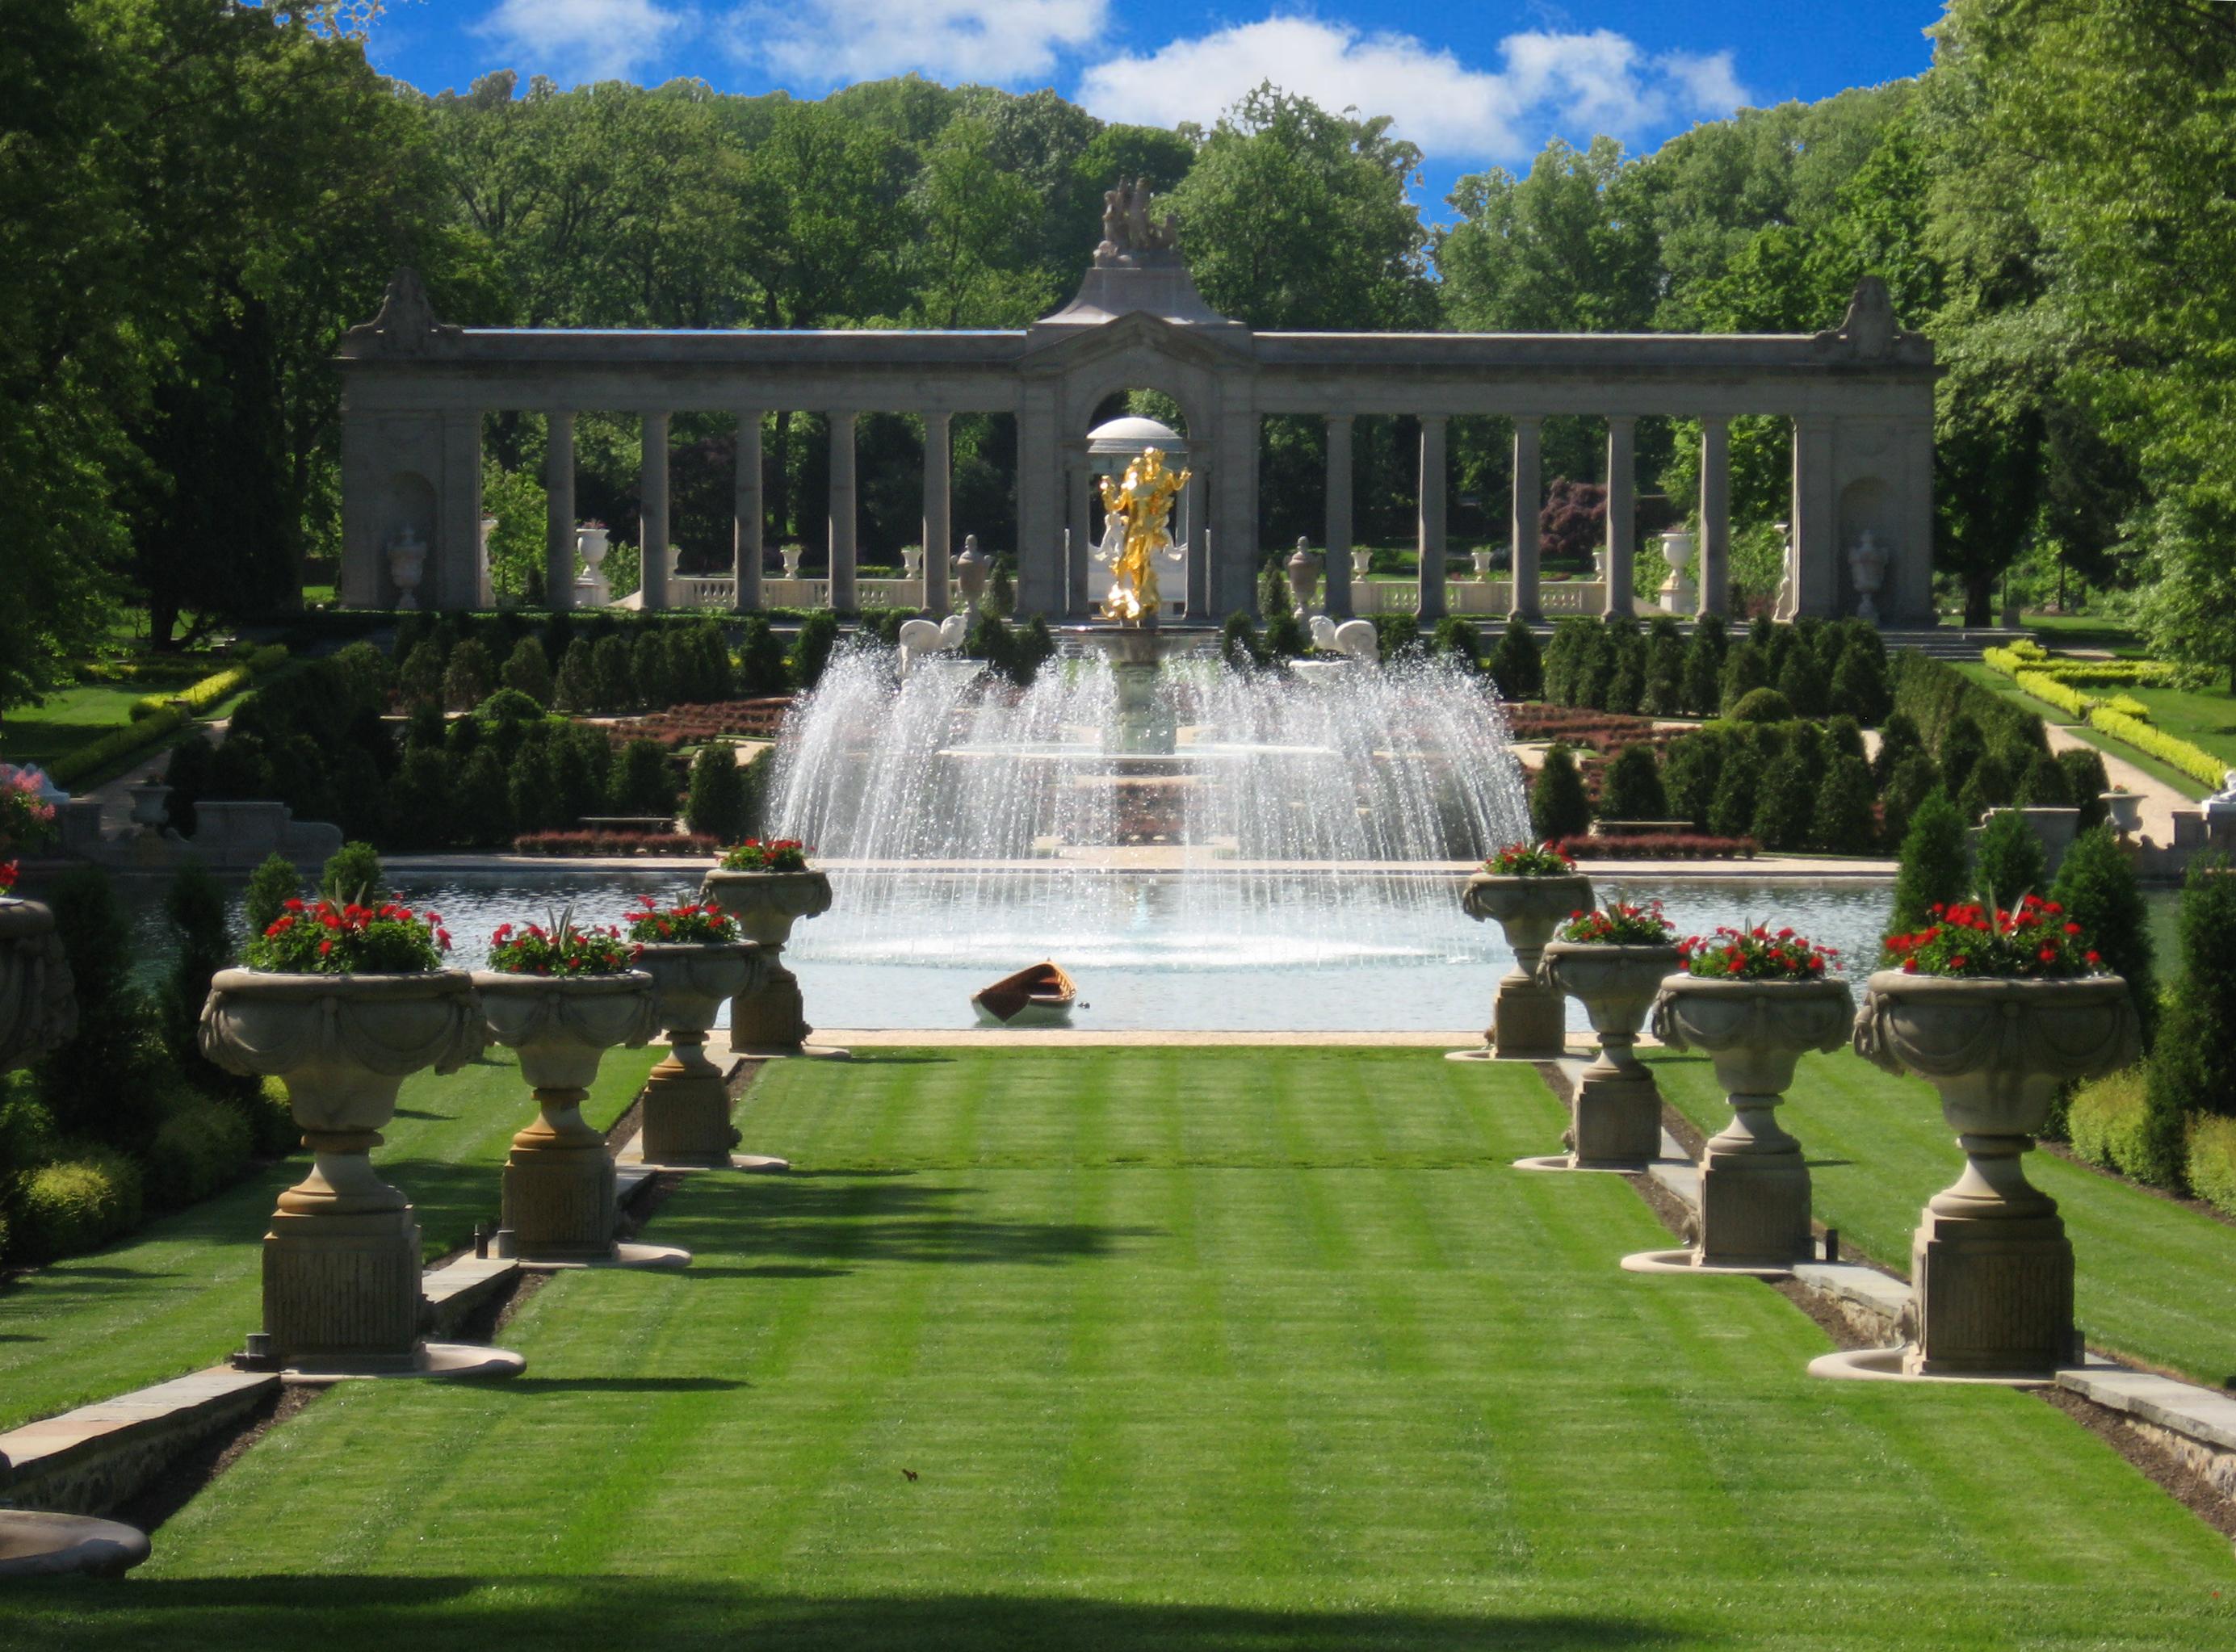 Pickwick Gardens